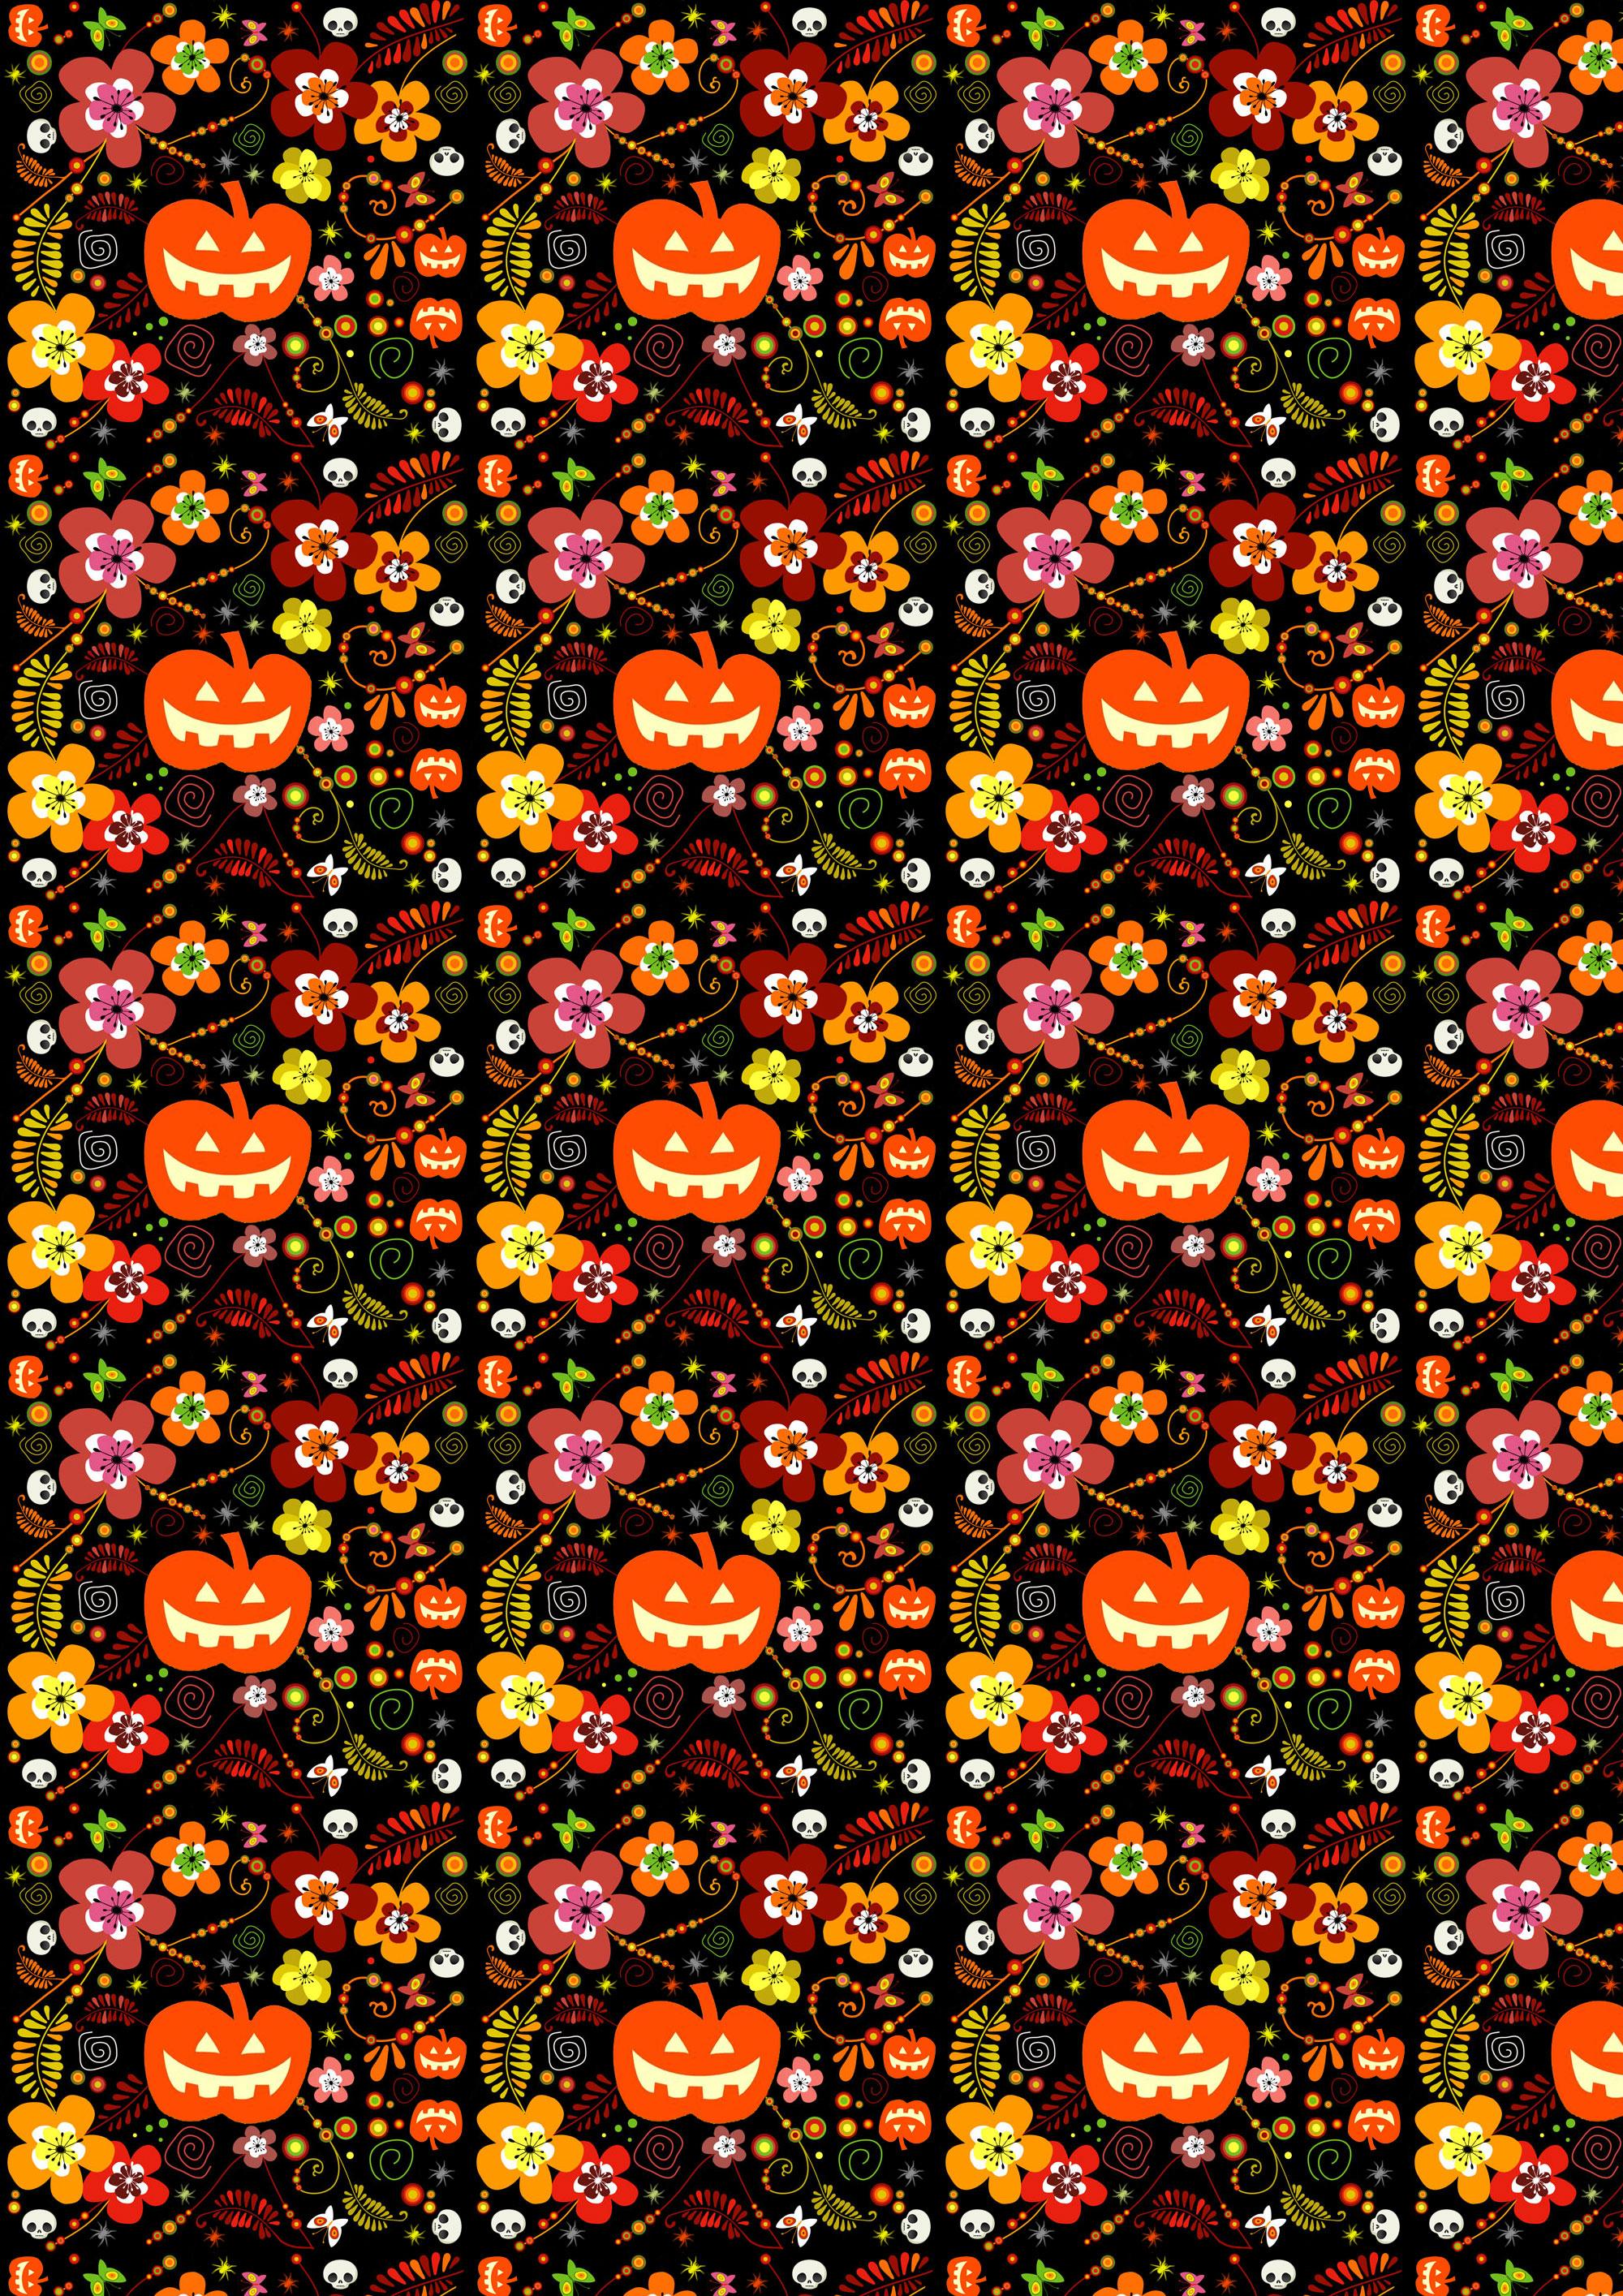 Free Scrapbook Paper: Halloween Pumpkins And Flowers   Rooftop Post - Free Printable Fall Scrapbook Paper